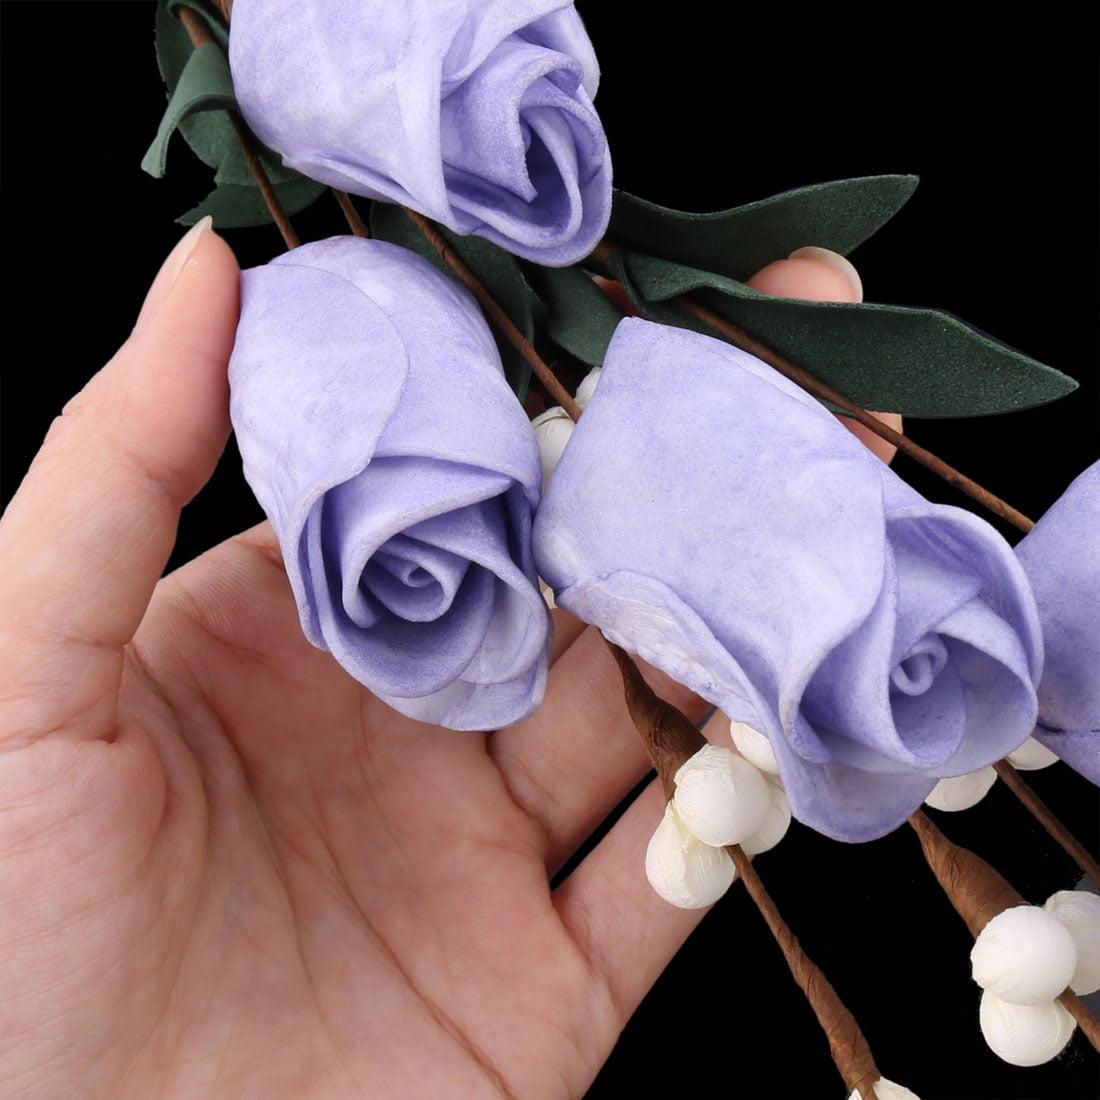 Living Room Garden Foam Tulip Shaped Table Decor Artificial Flower Purple 2 Pcs - image 3 of 4